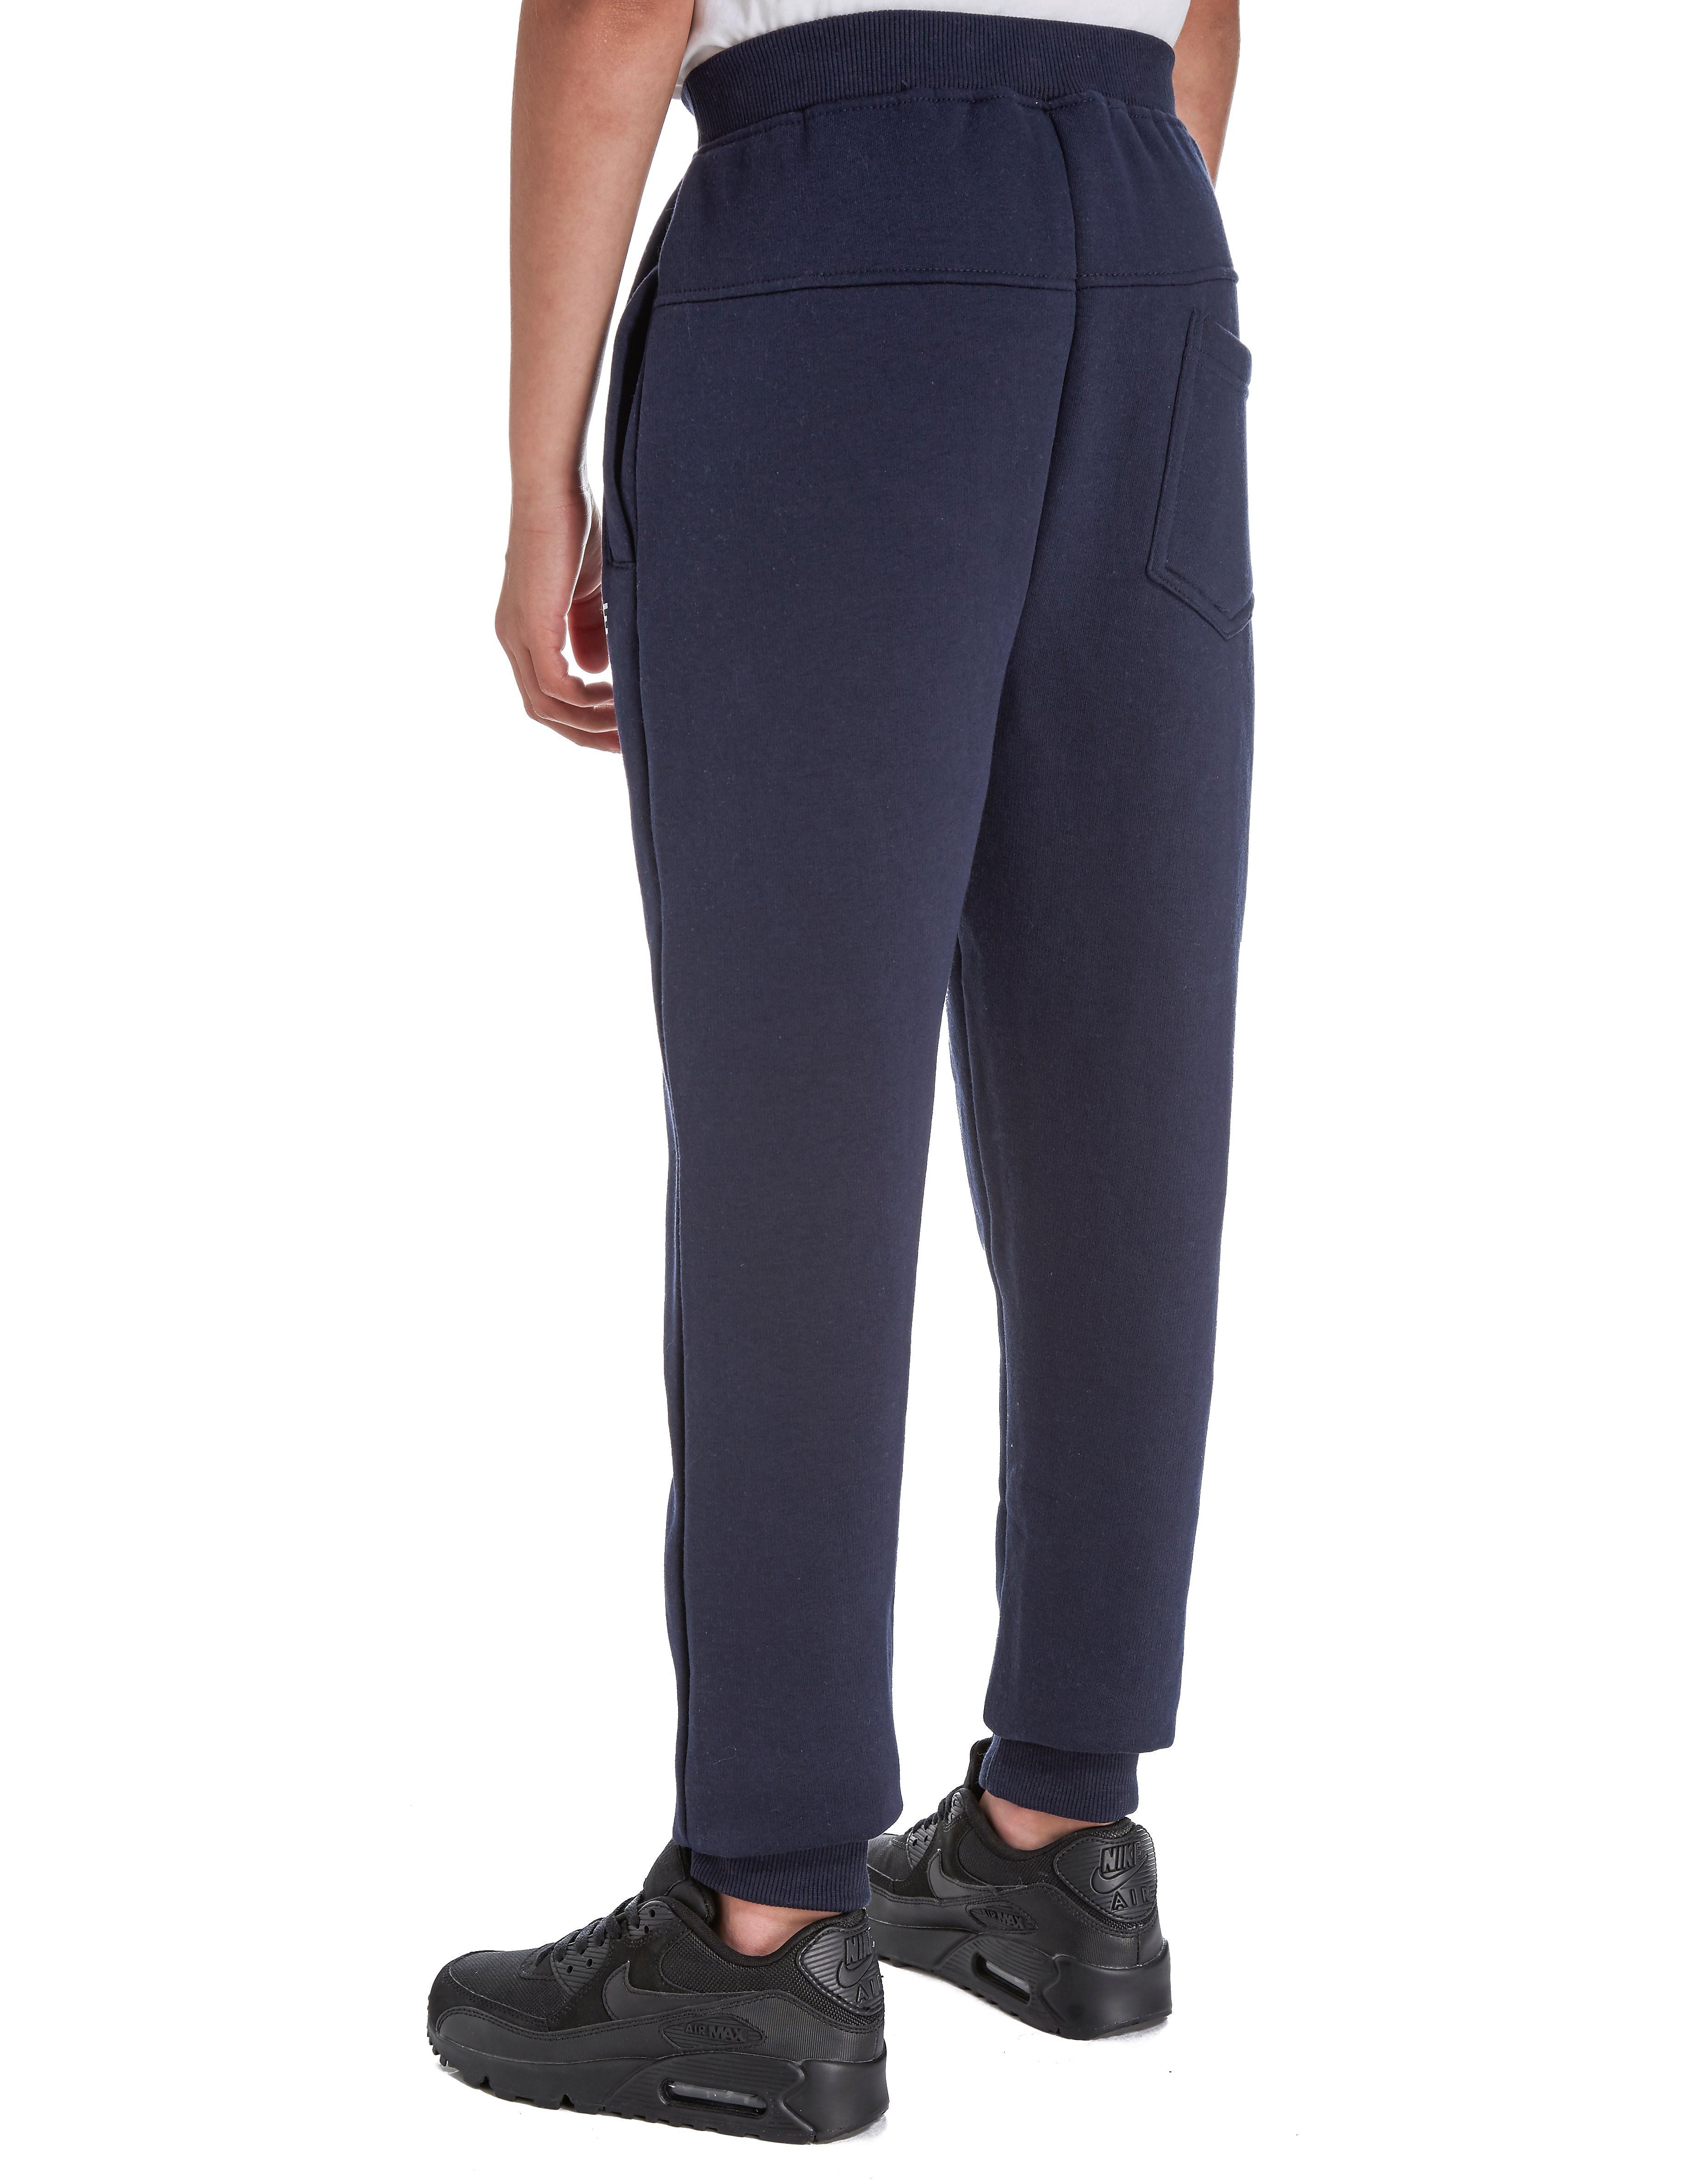 McKenzie Edward Track Pants Juniors'